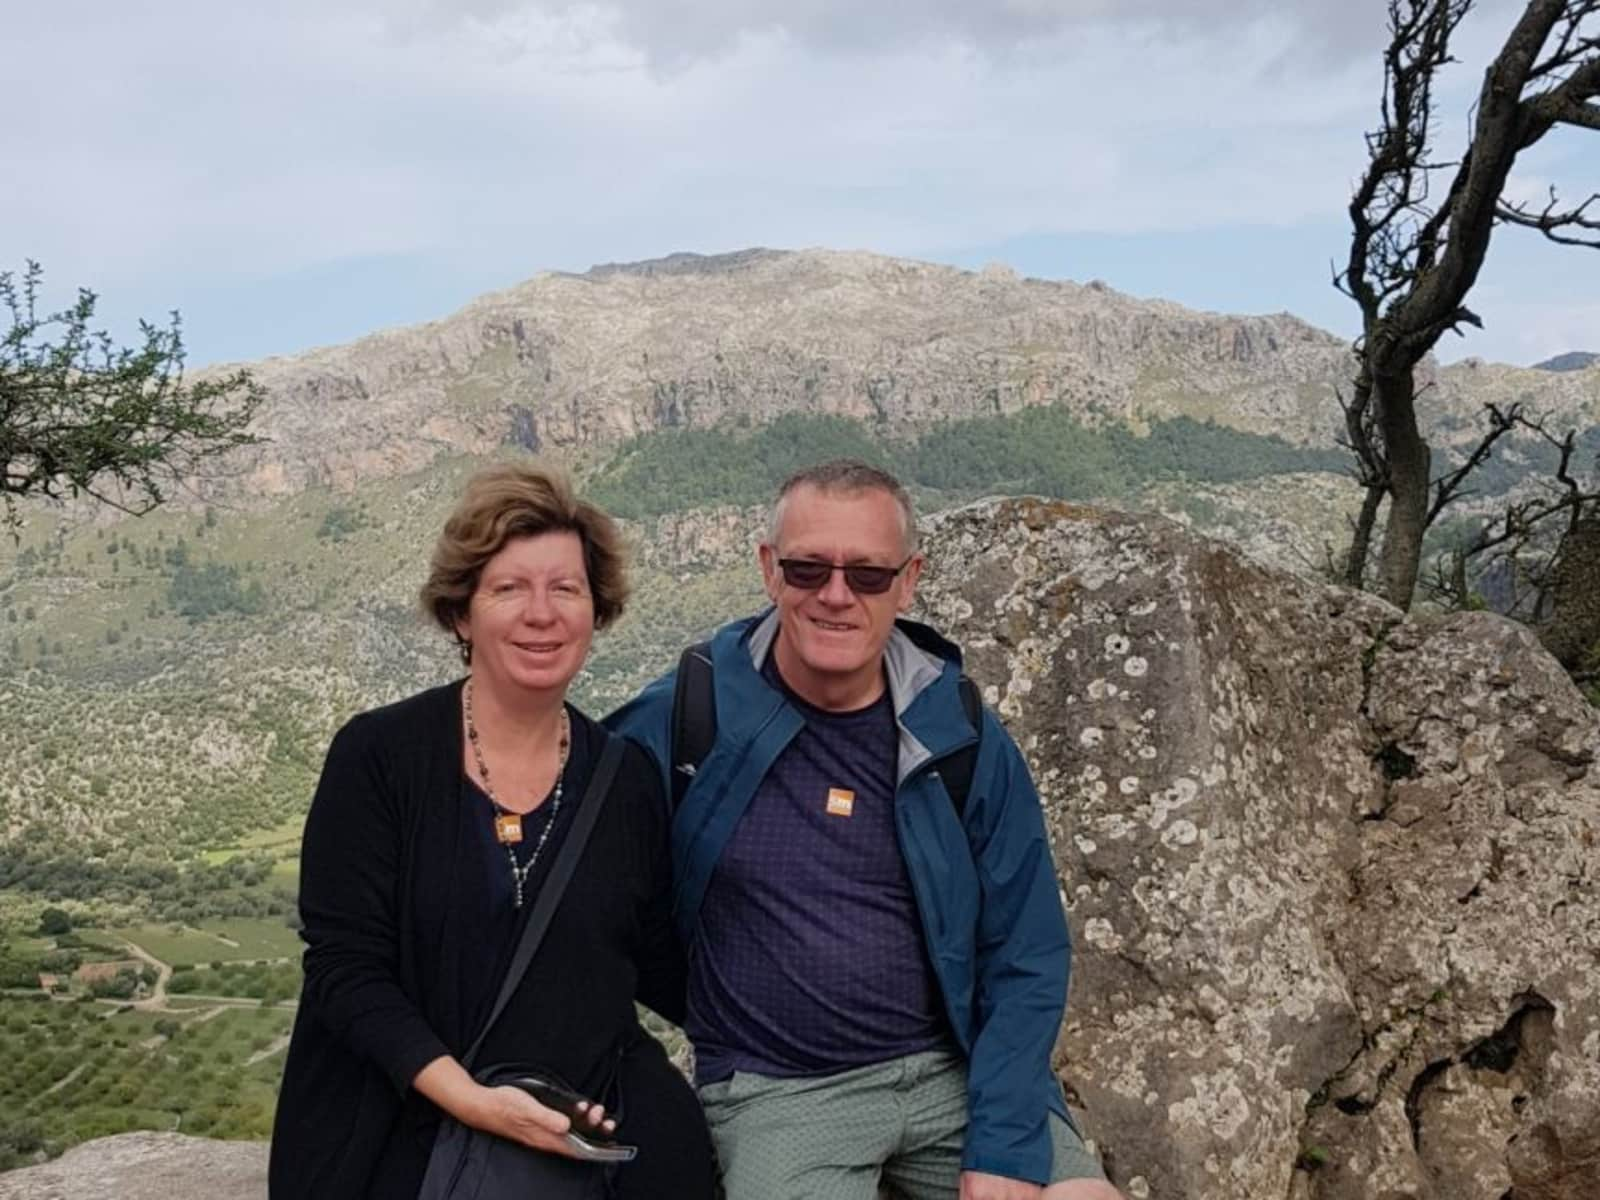 Richard & Caroline from Perth, Western Australia, Australia